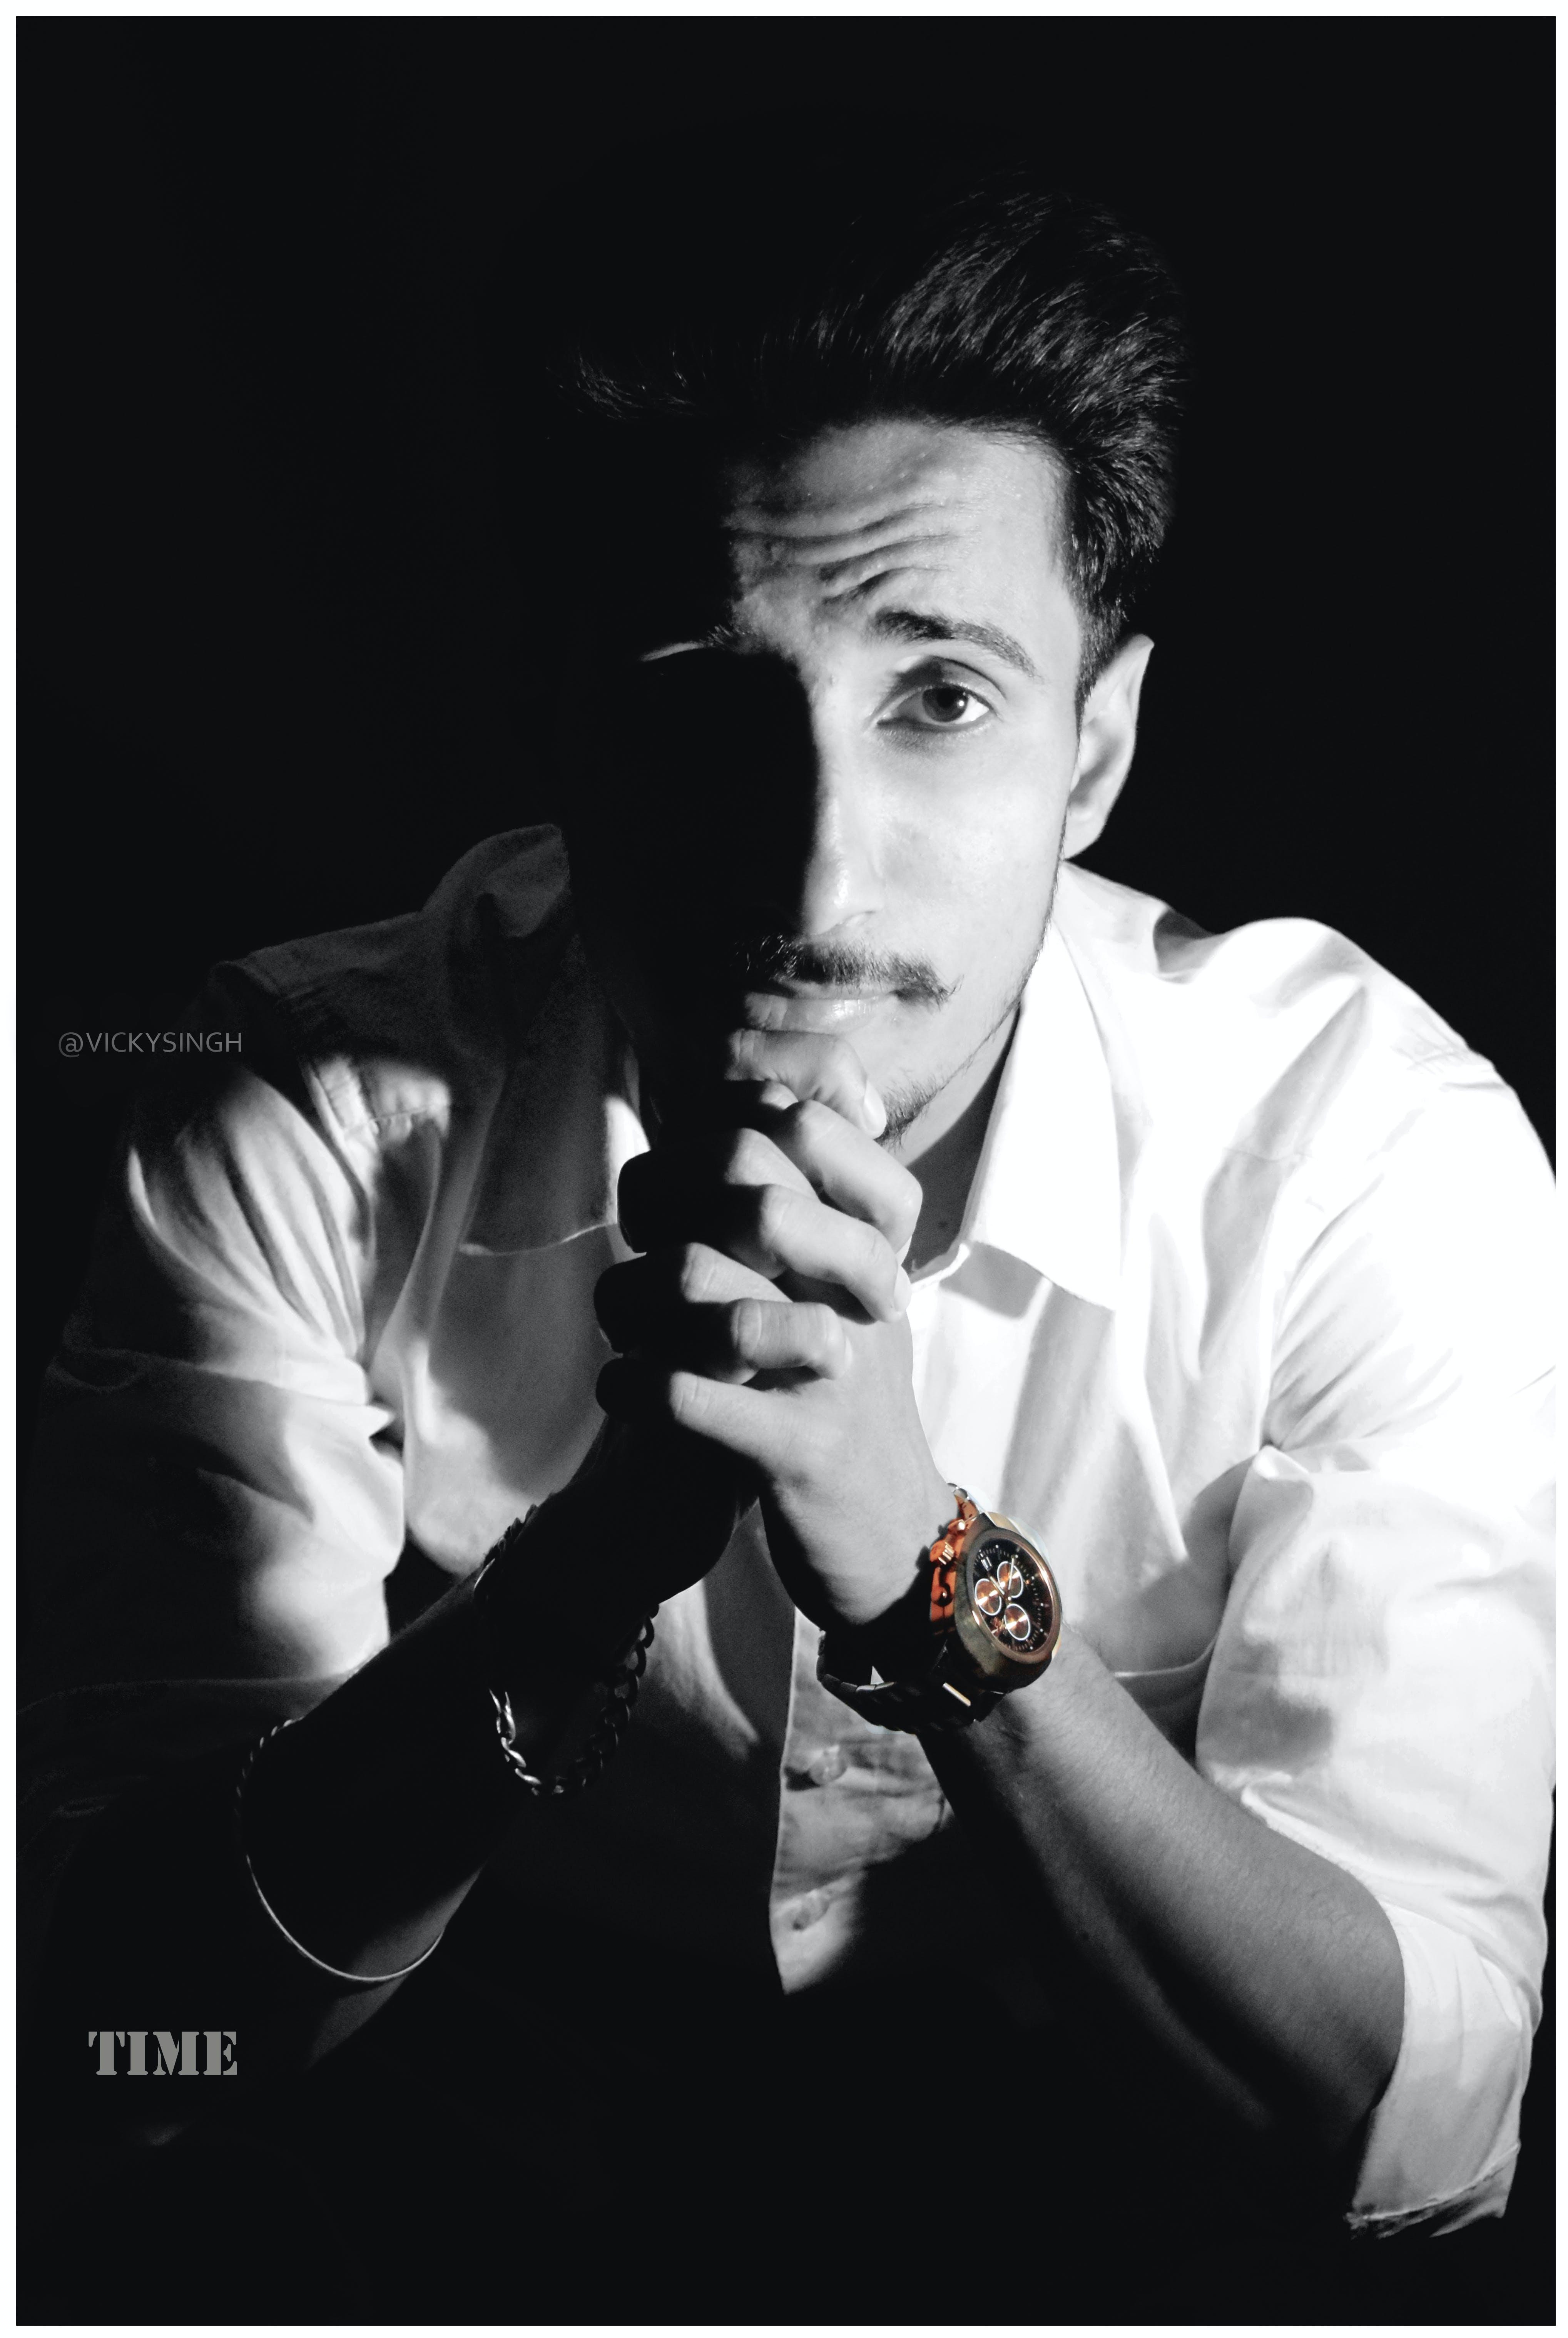 Free stock photo of Adobe Photoshop, black and white, black background, classy